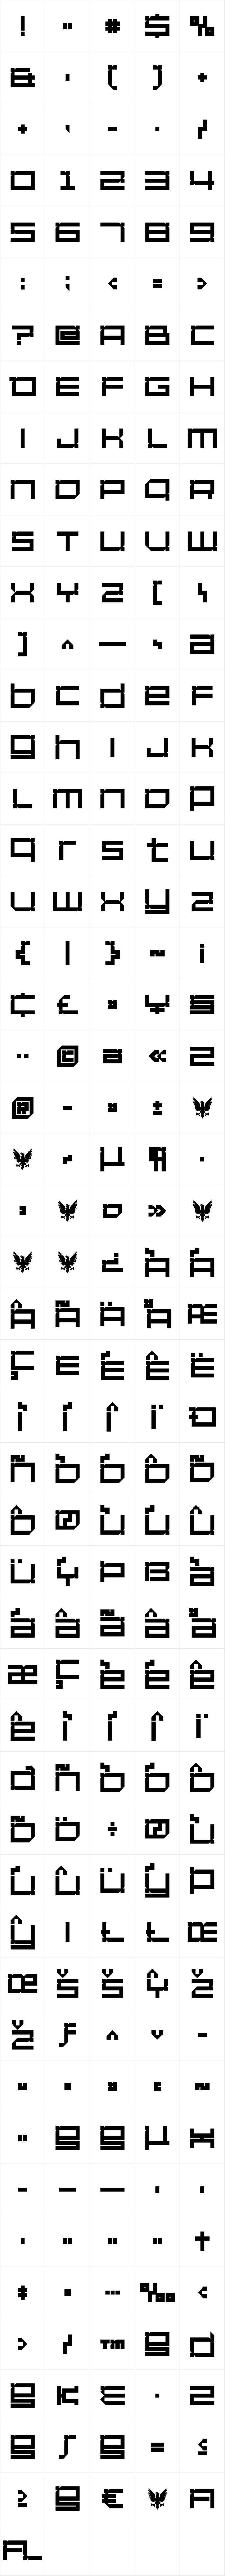 YWFT DesignGraphik Extra Bold